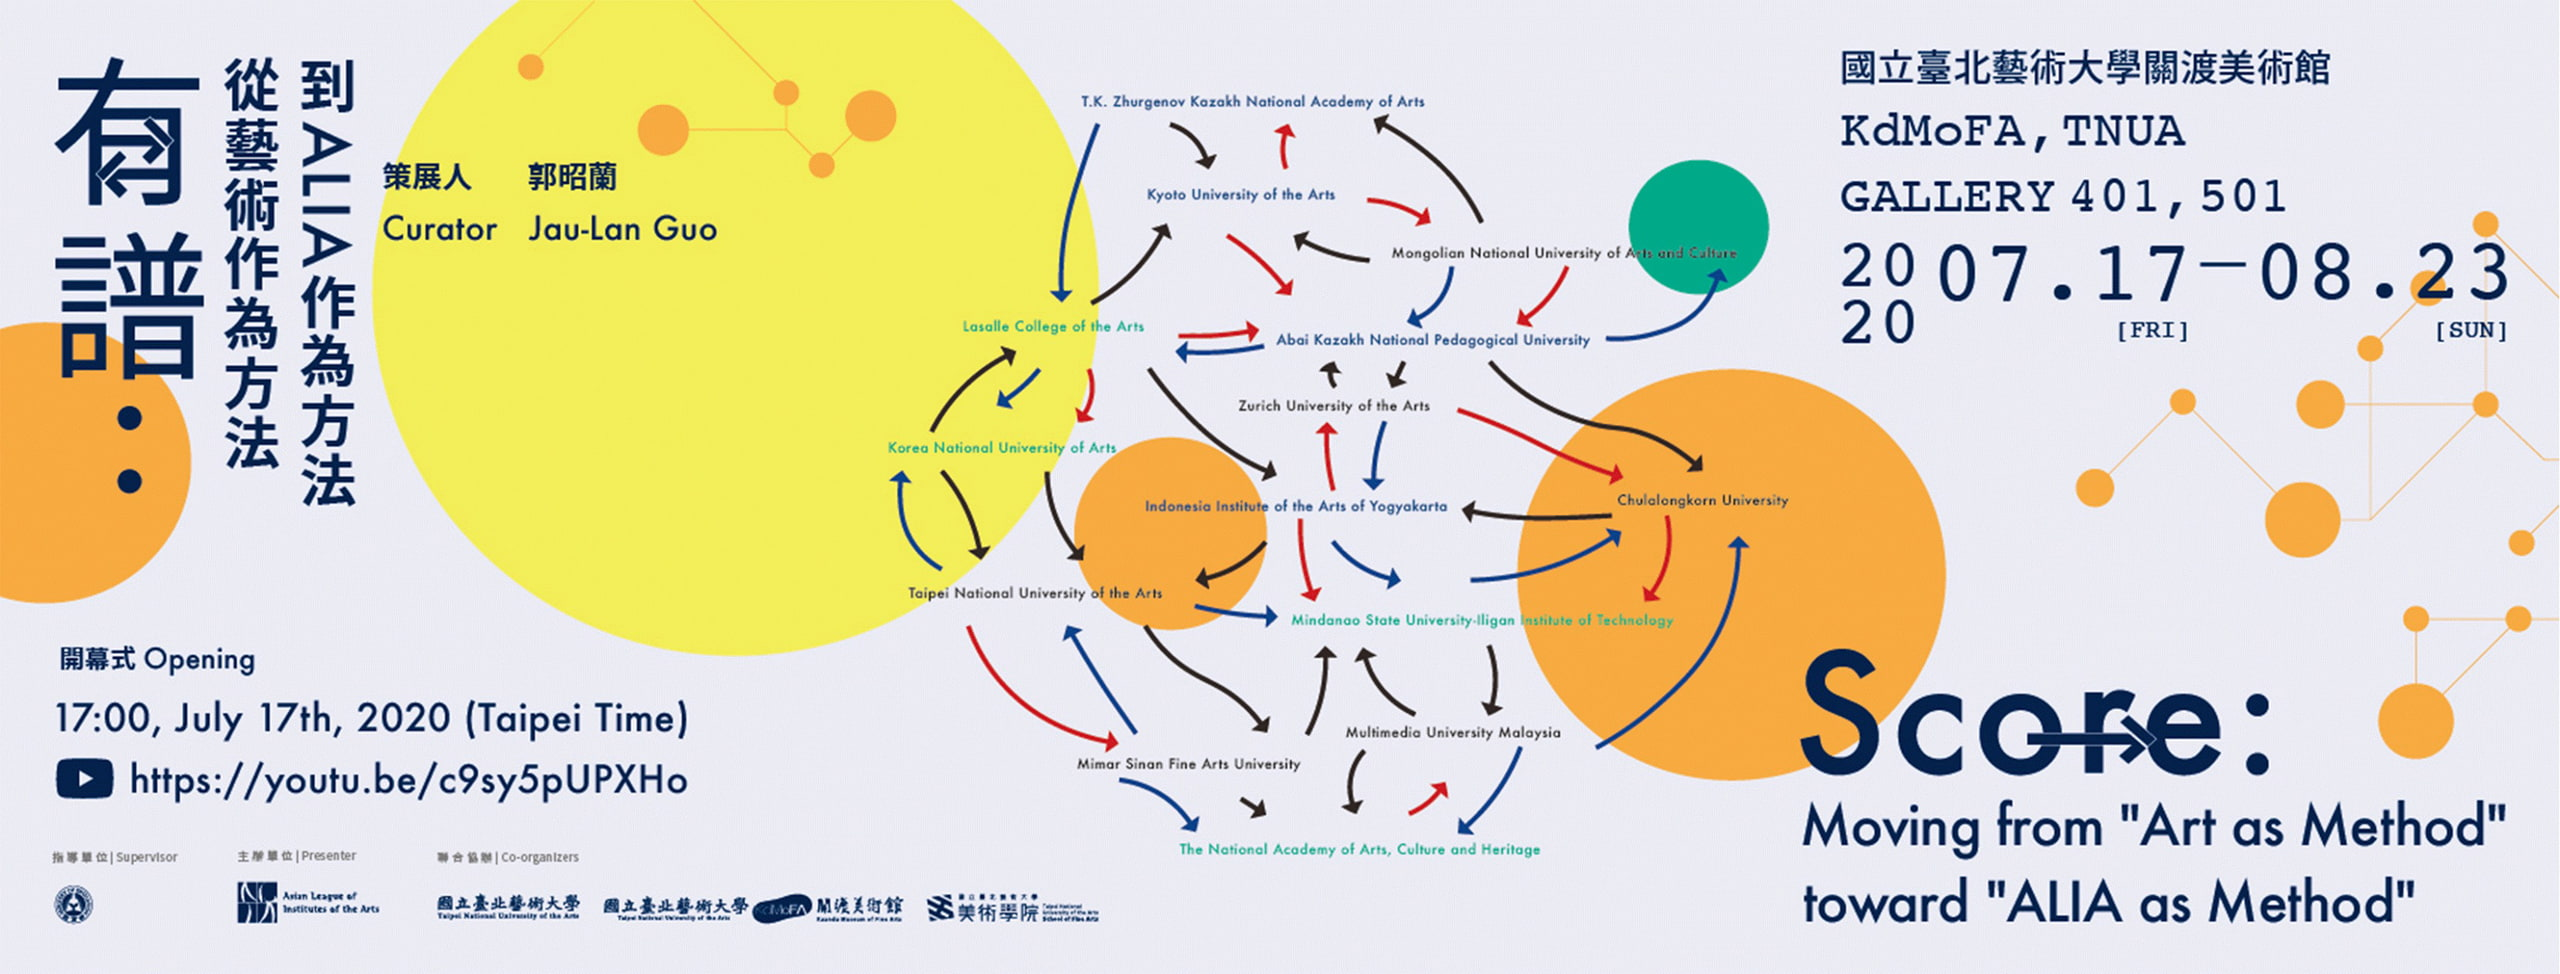 "SCORE: Moving from ""Art as Method"" toward ""ALIA as Method"""